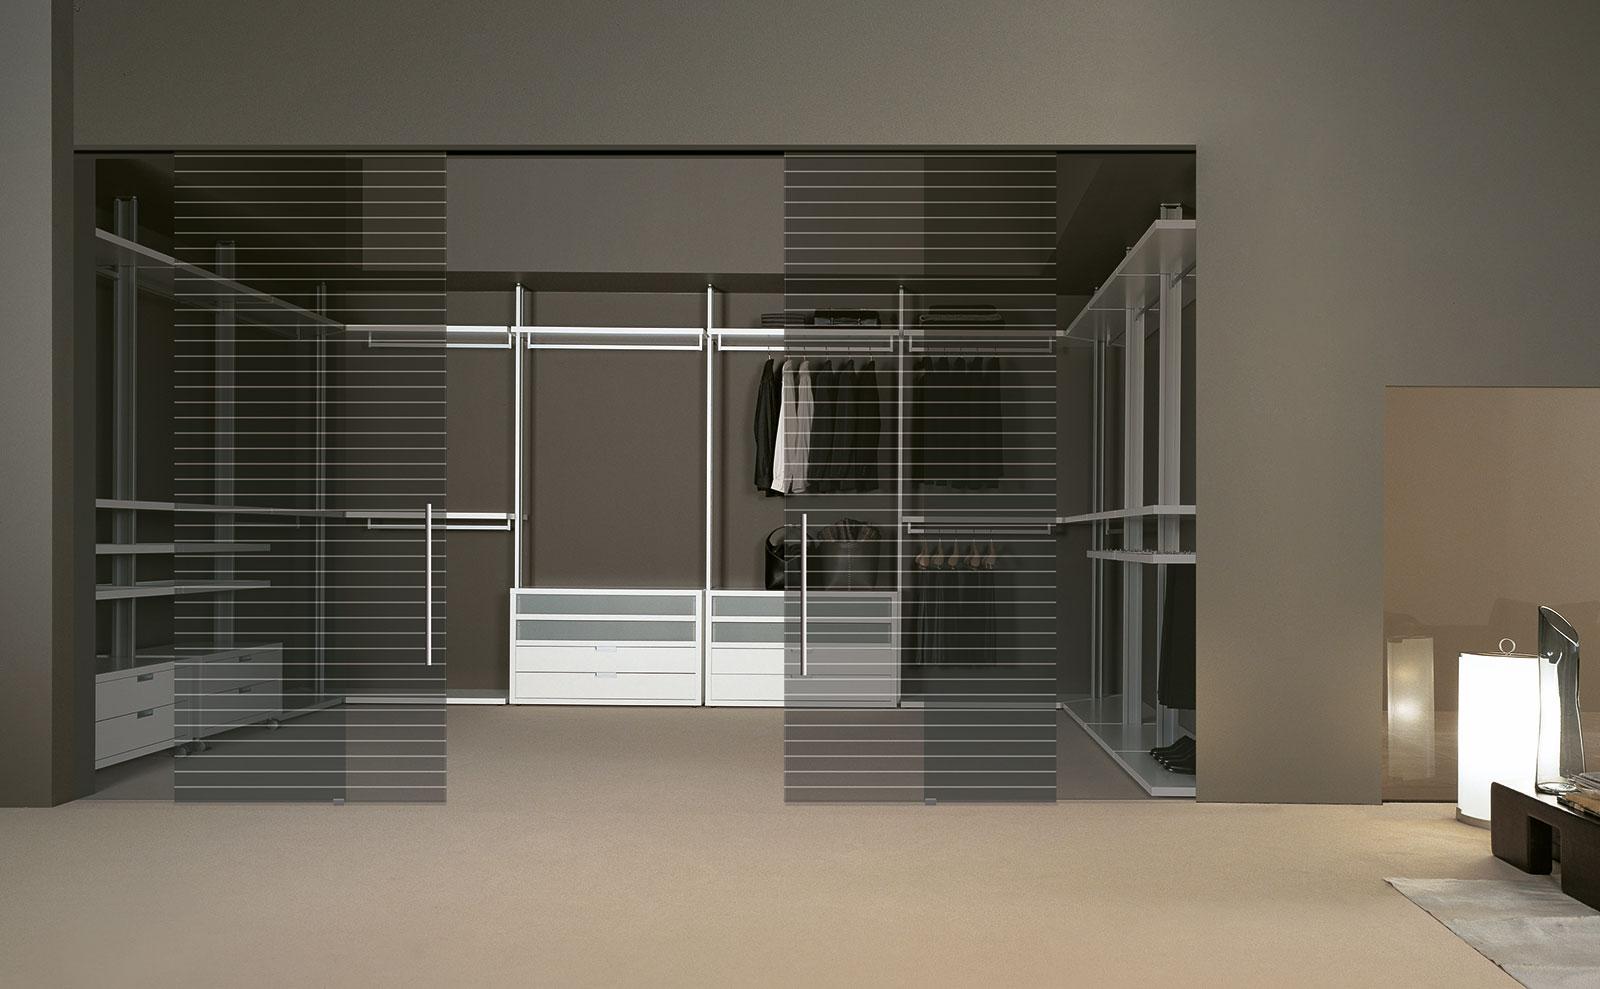 Cabina armadio su misura vesta henry glass - Porte scorrevoli per cabine armadio prezzi ...